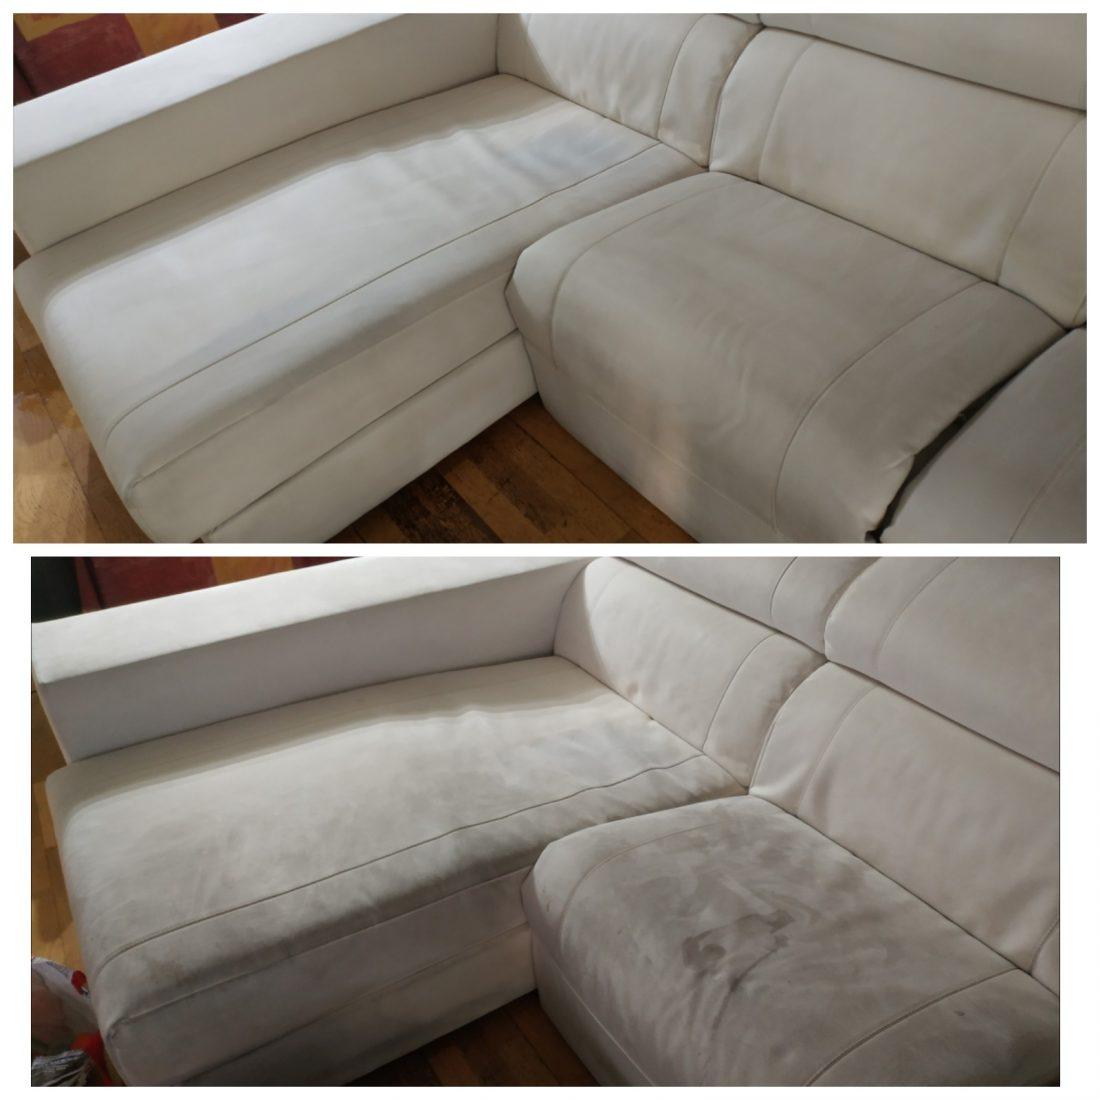 Limpieza de tapicer as a domicilio limpiotapicerias com - Limpieza sofas a domicilio ...